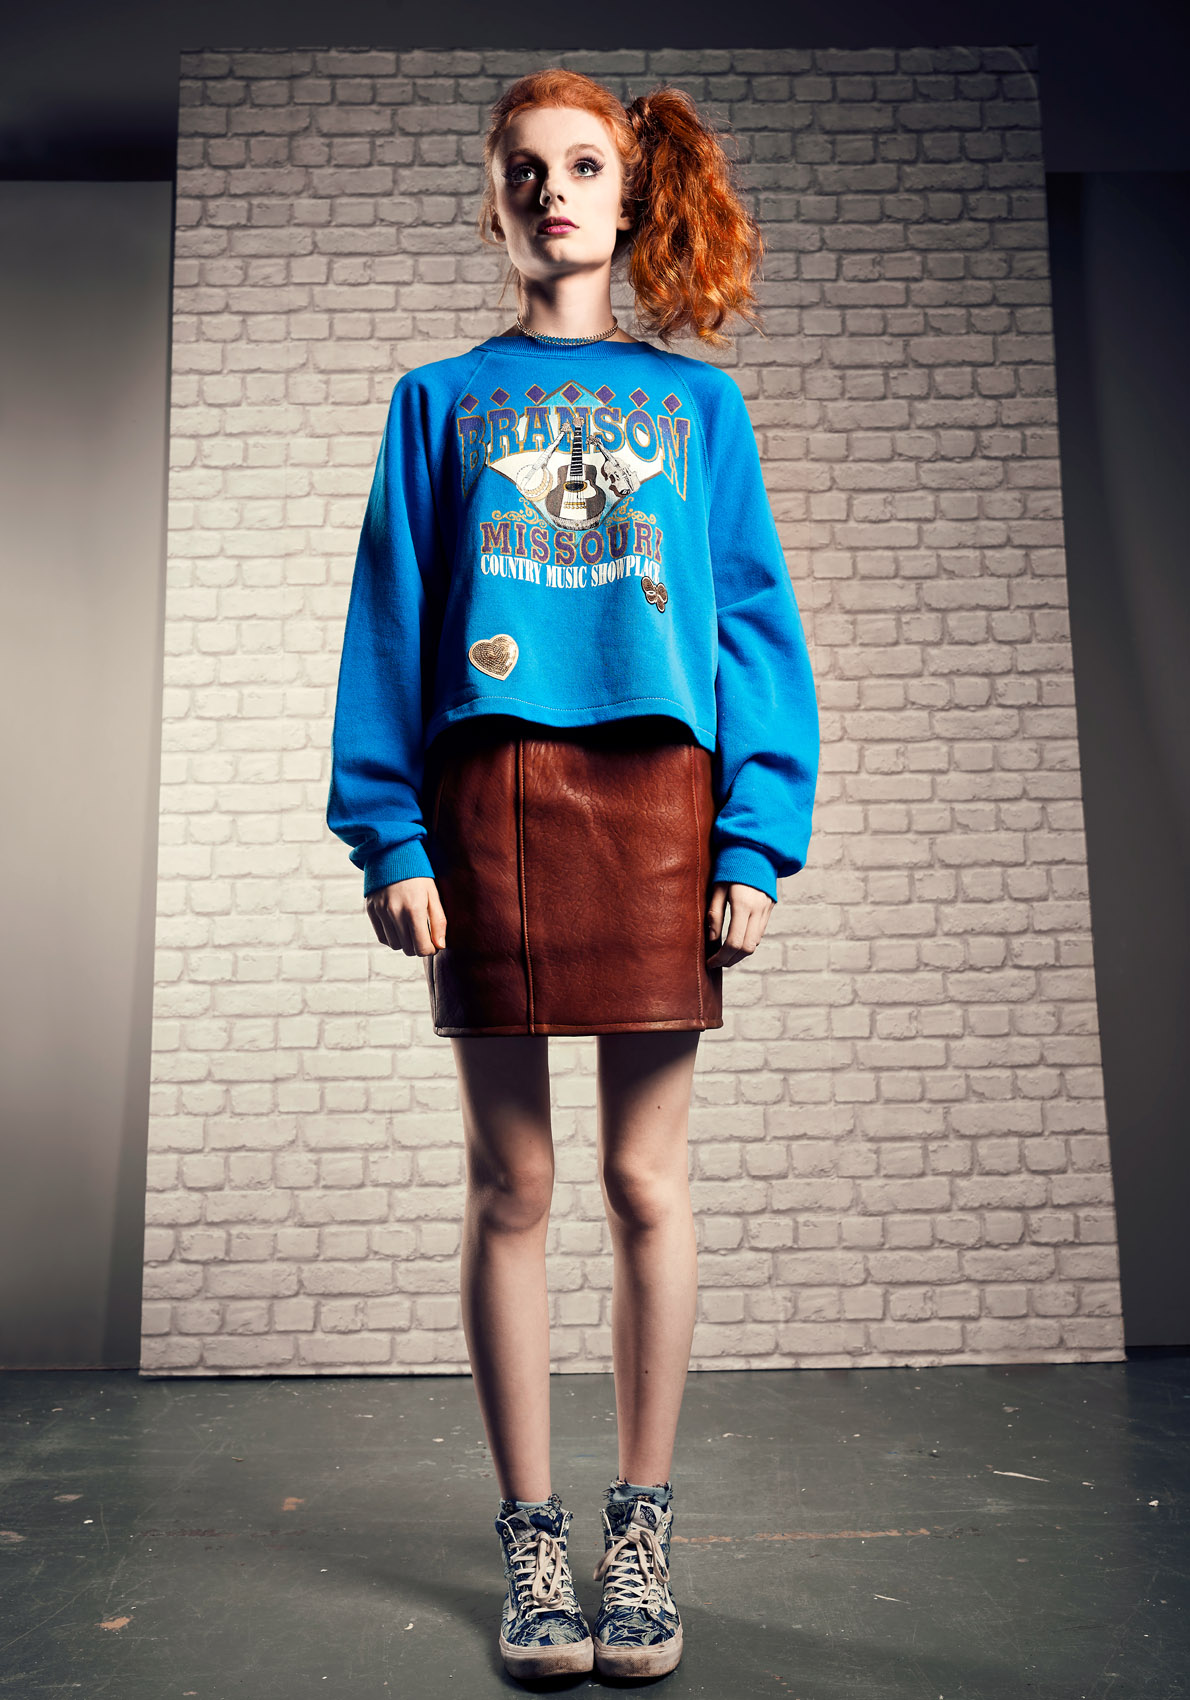 80s fashion shoot